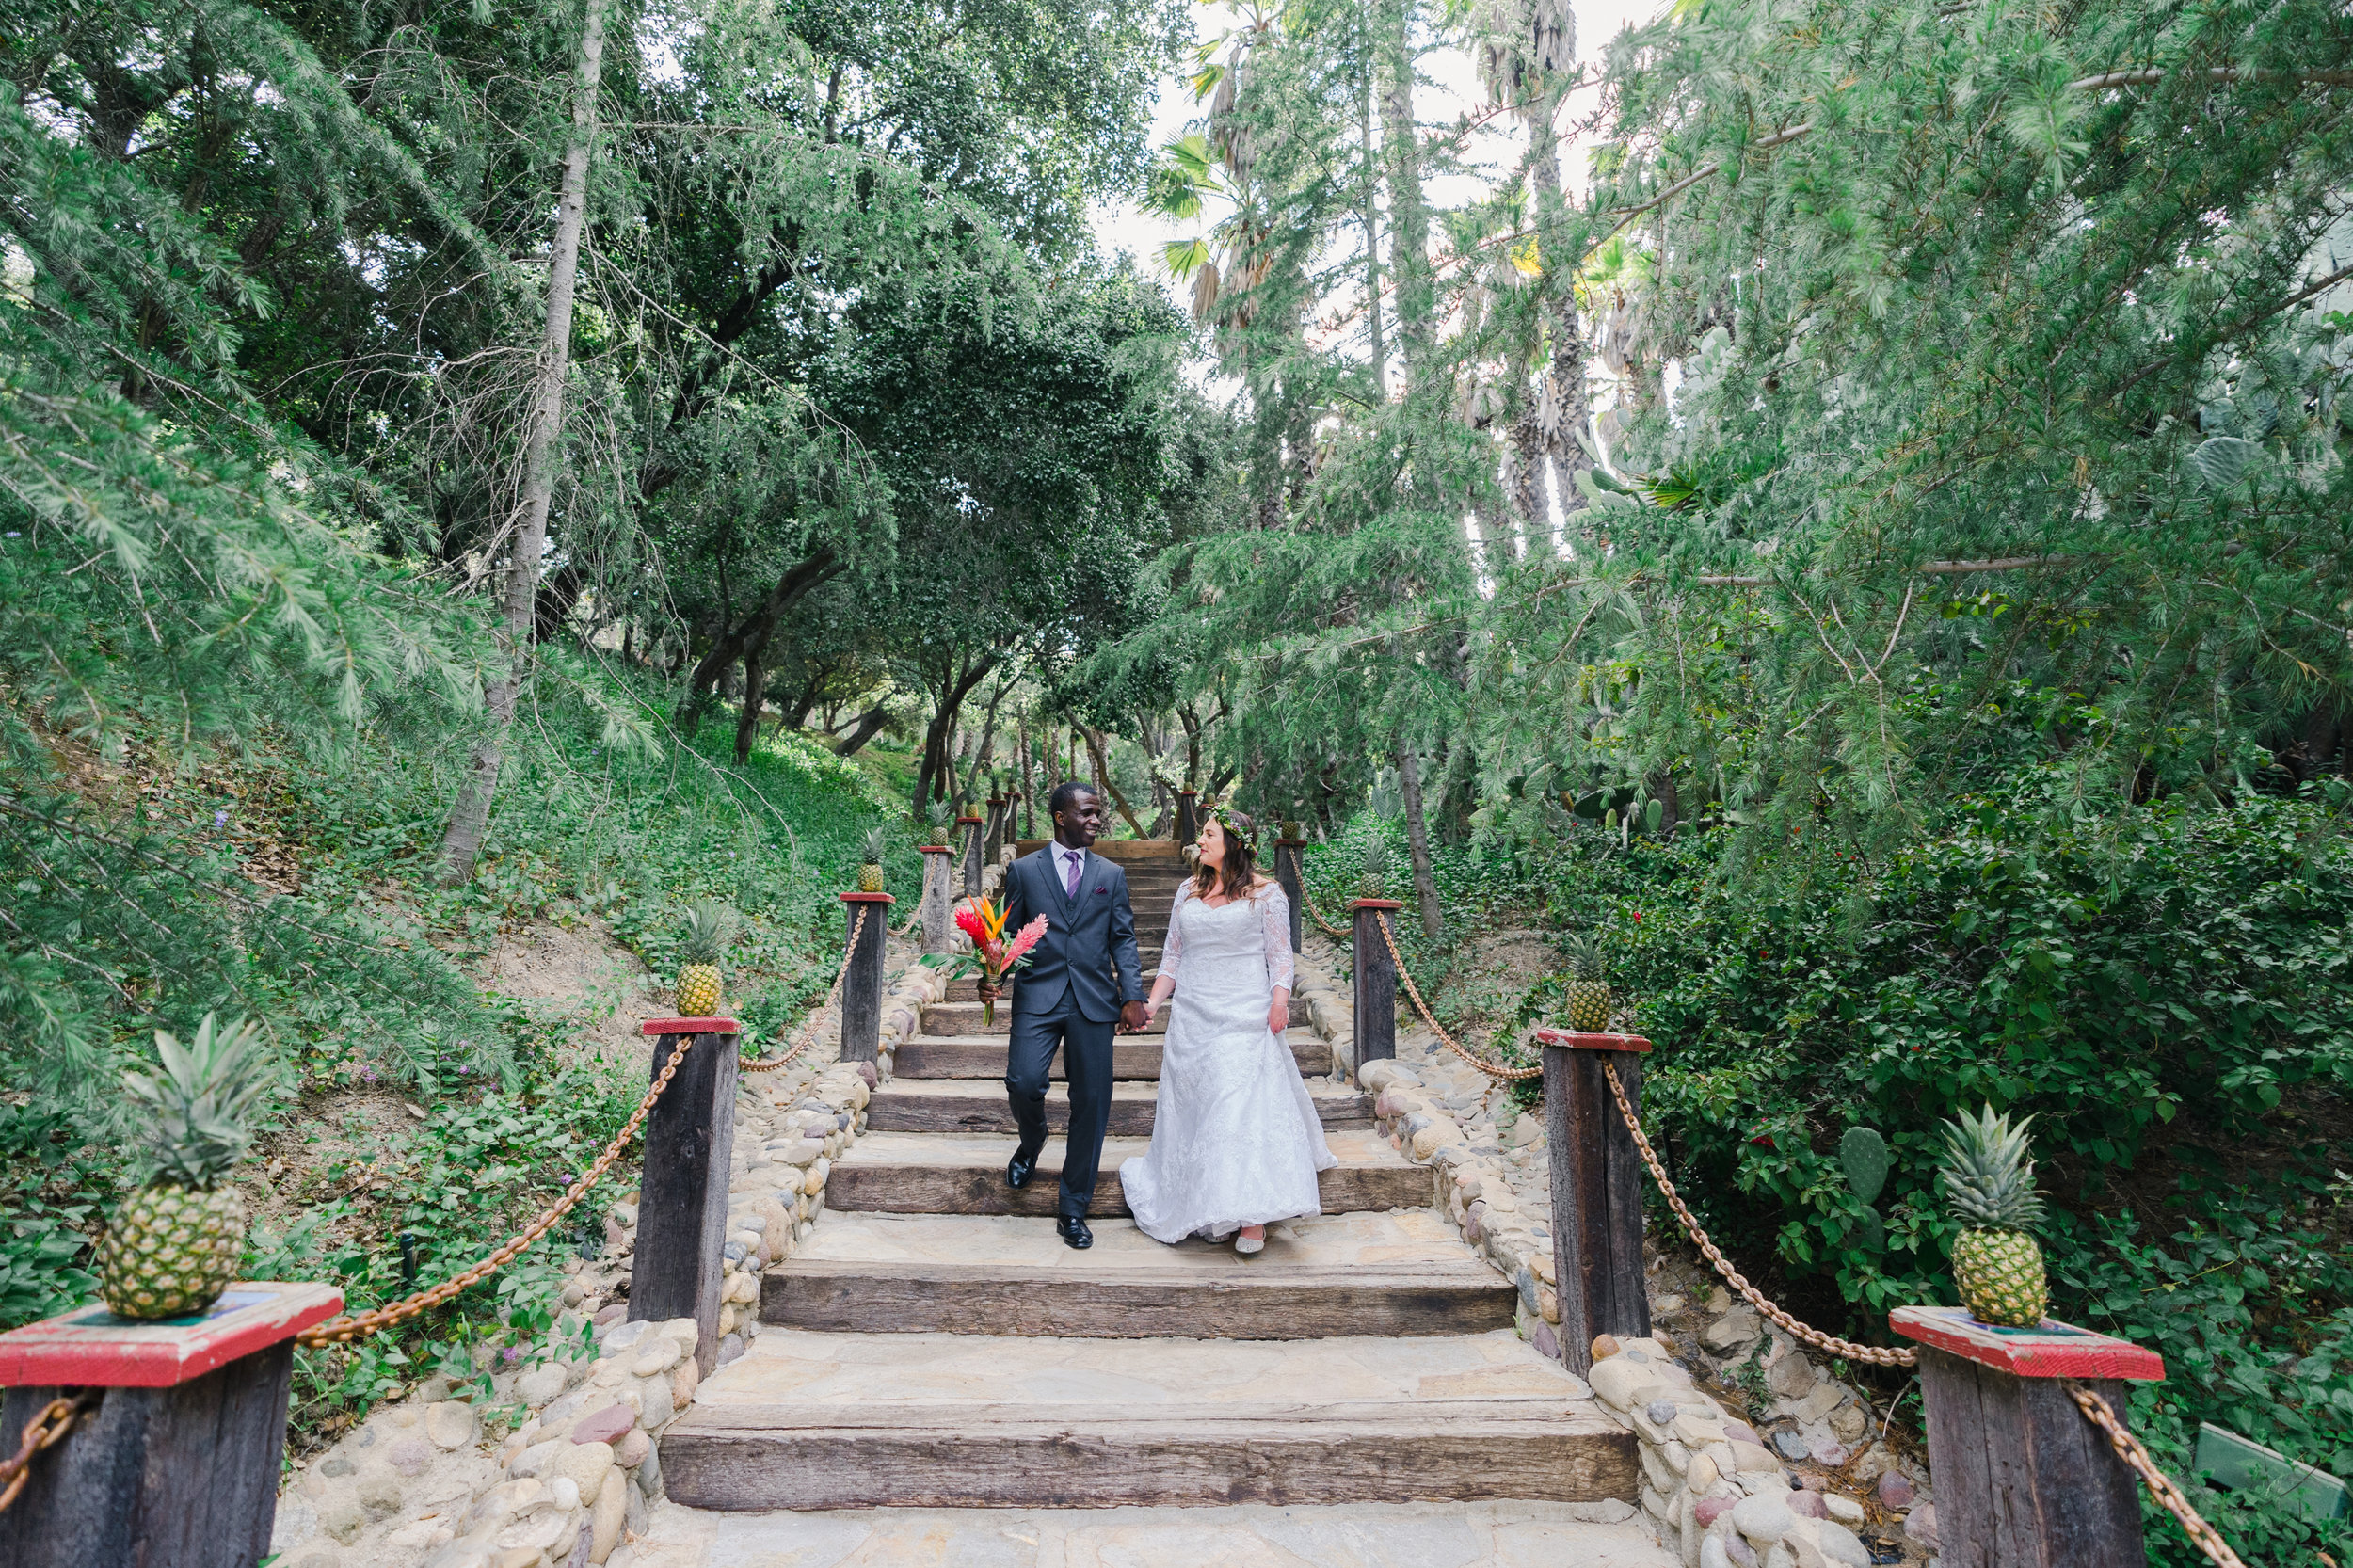 rancho-las-lomas-wedding-kelsey-sim_0162.JPG